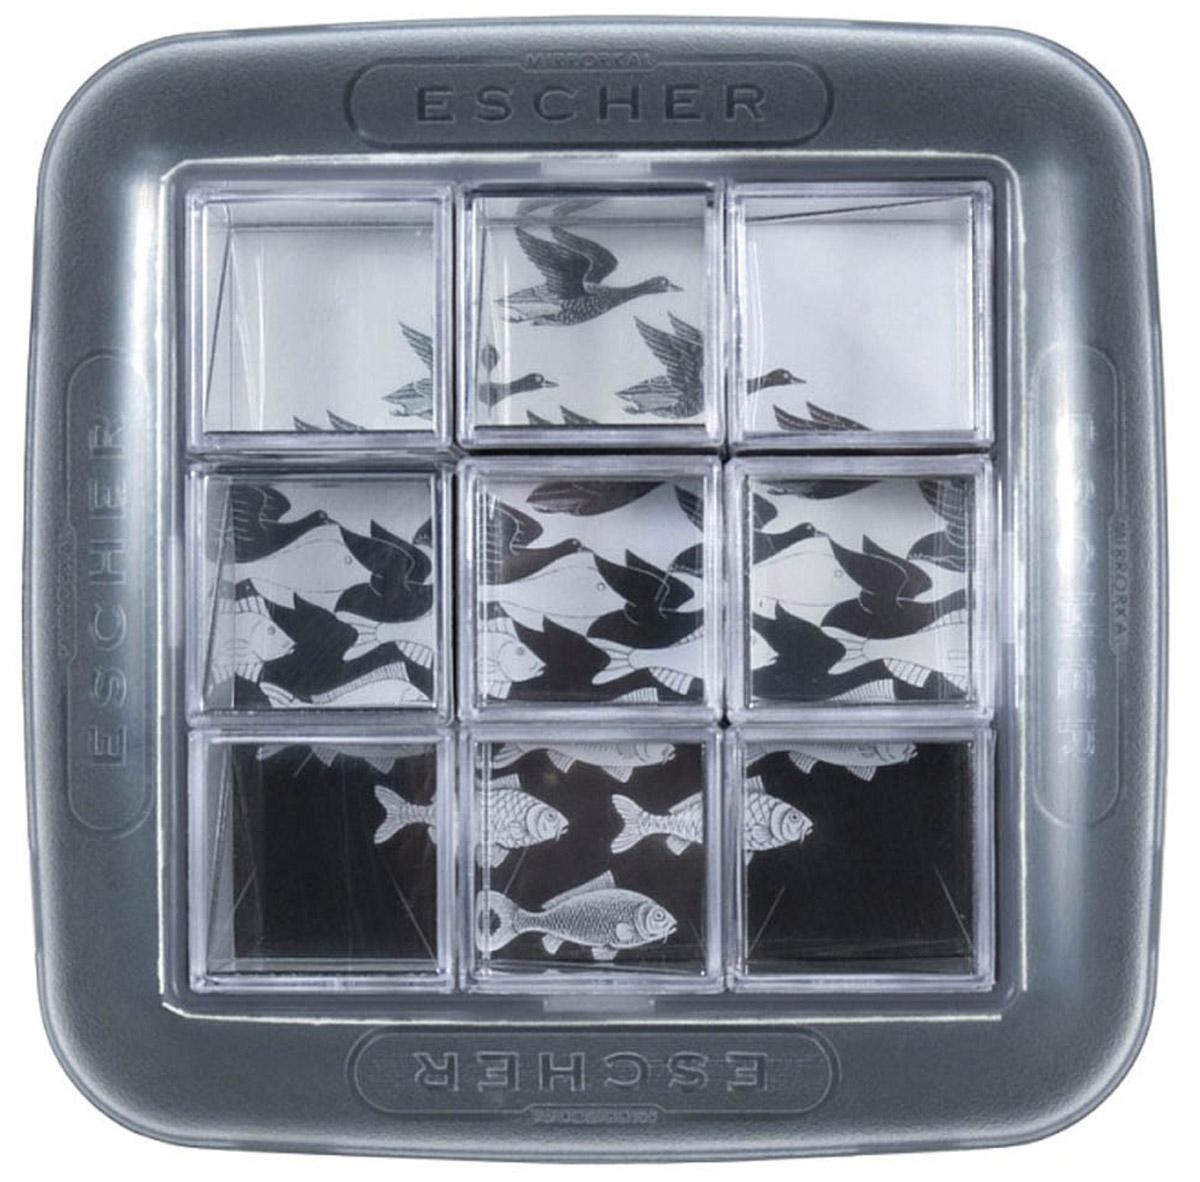 Головоломка Эшер (Mirrorkal Escher) головоломка эшер